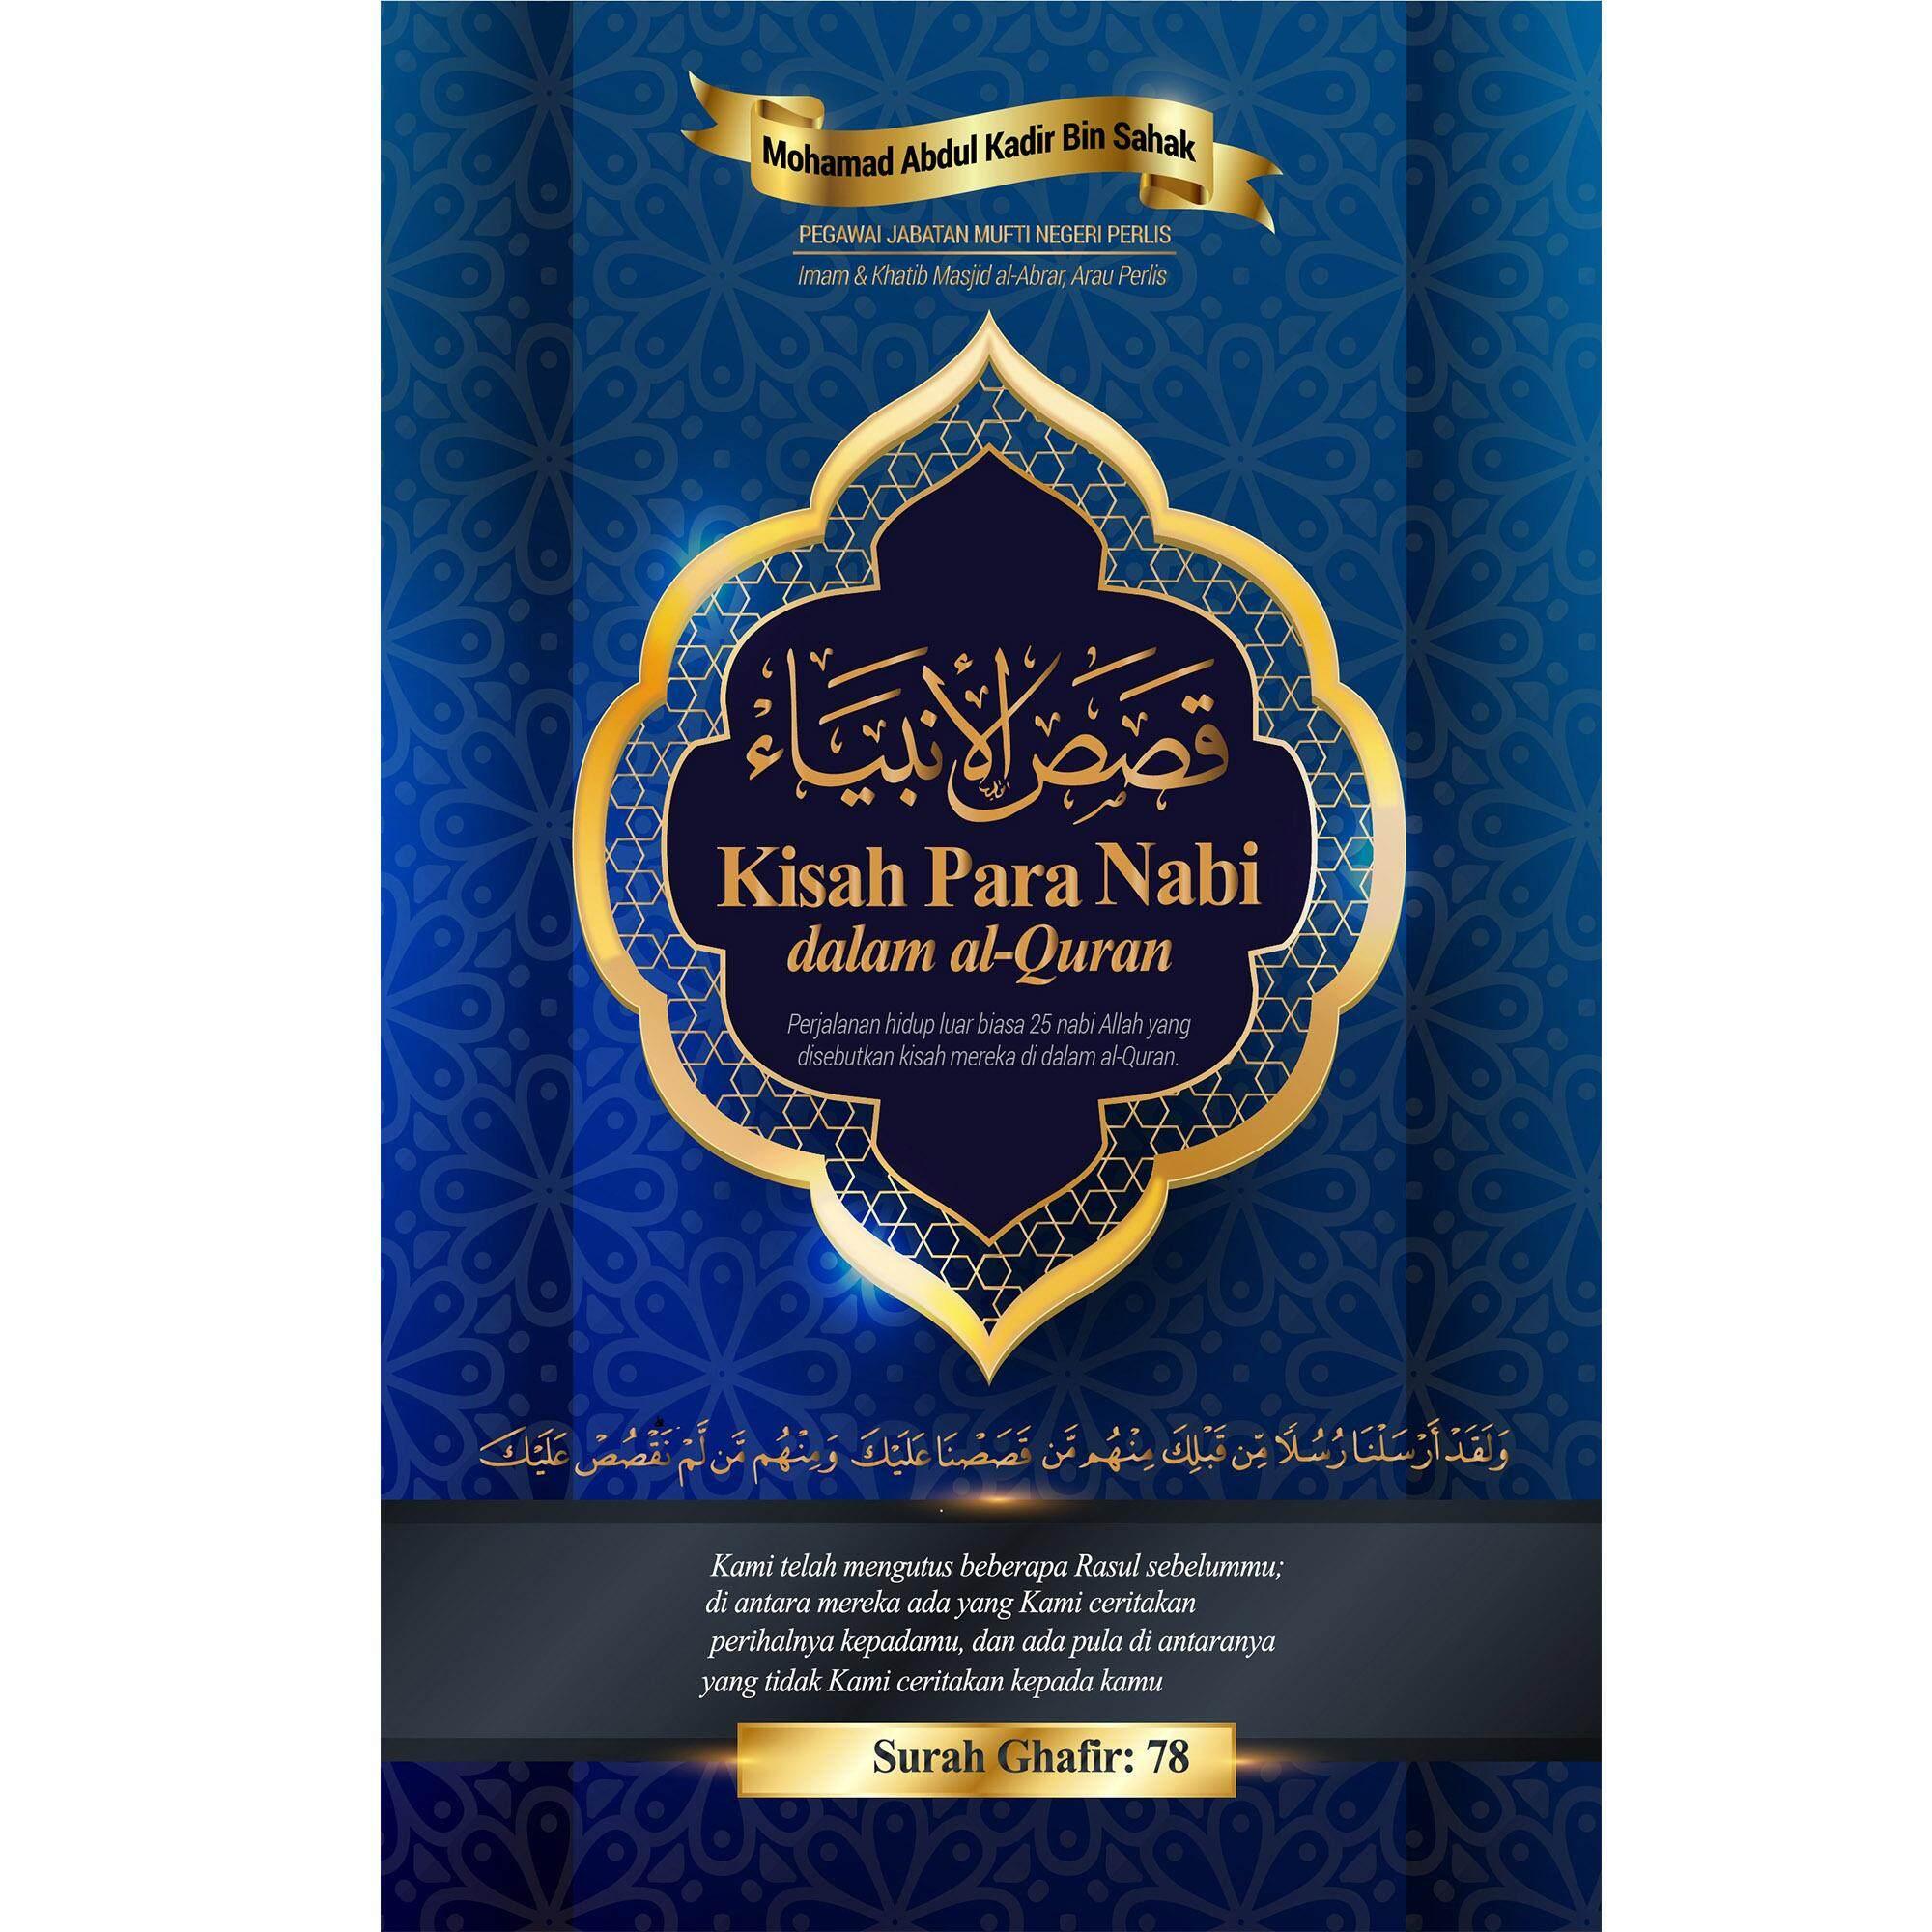 Kisah Para Nabi di dalam Al-Quran